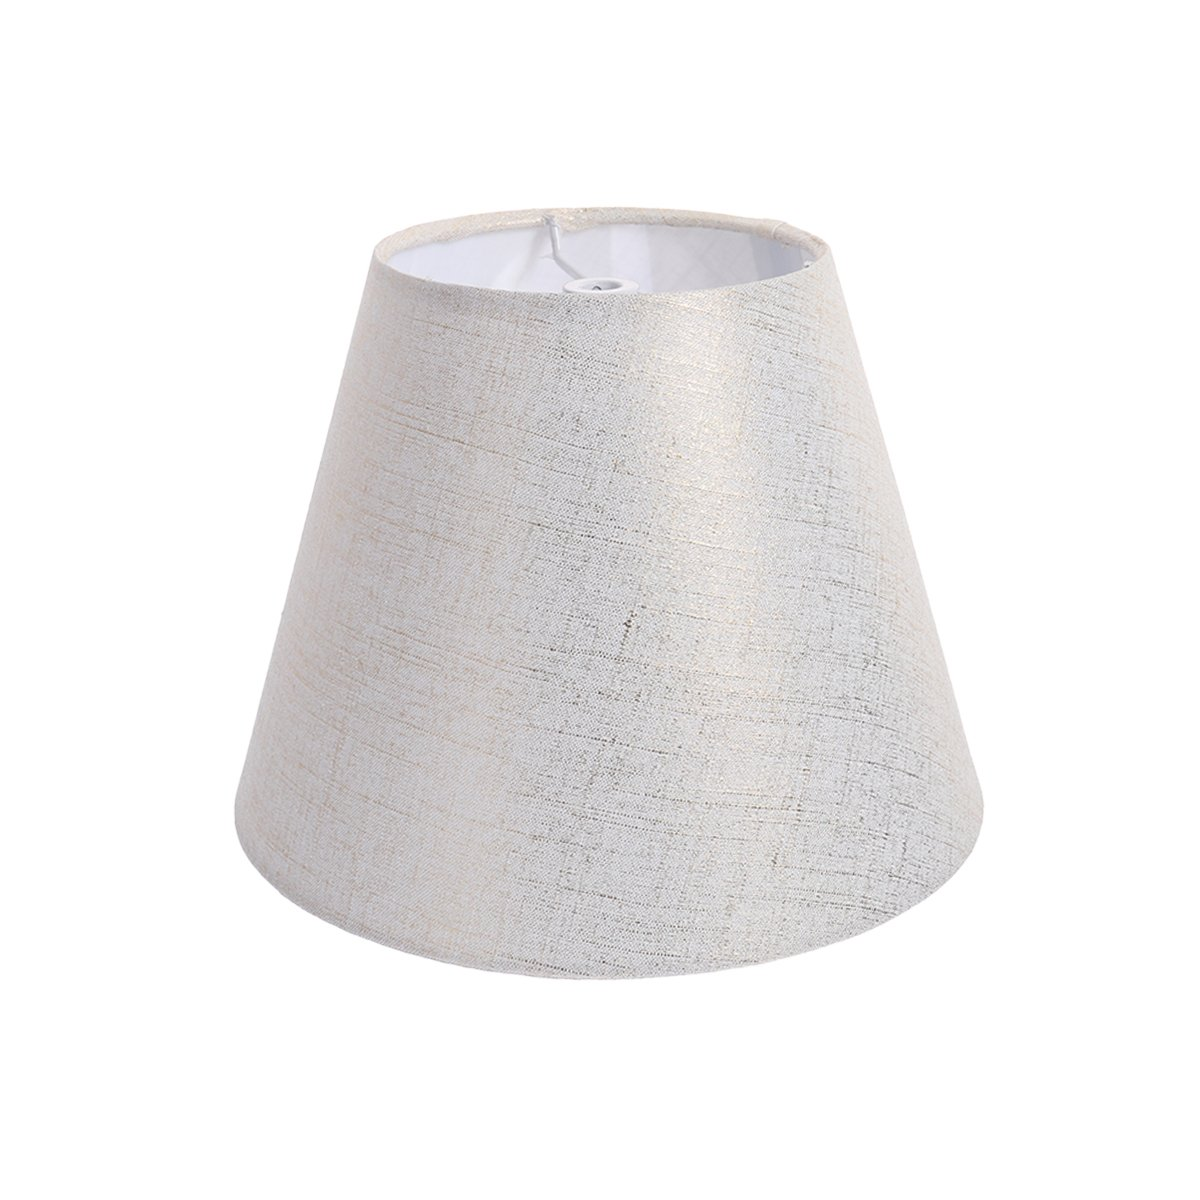 VORCOOL Natural Linen Clip On Lamp Shades Vintage Chandelier Lamp Shades for Hotel Restaurant Home